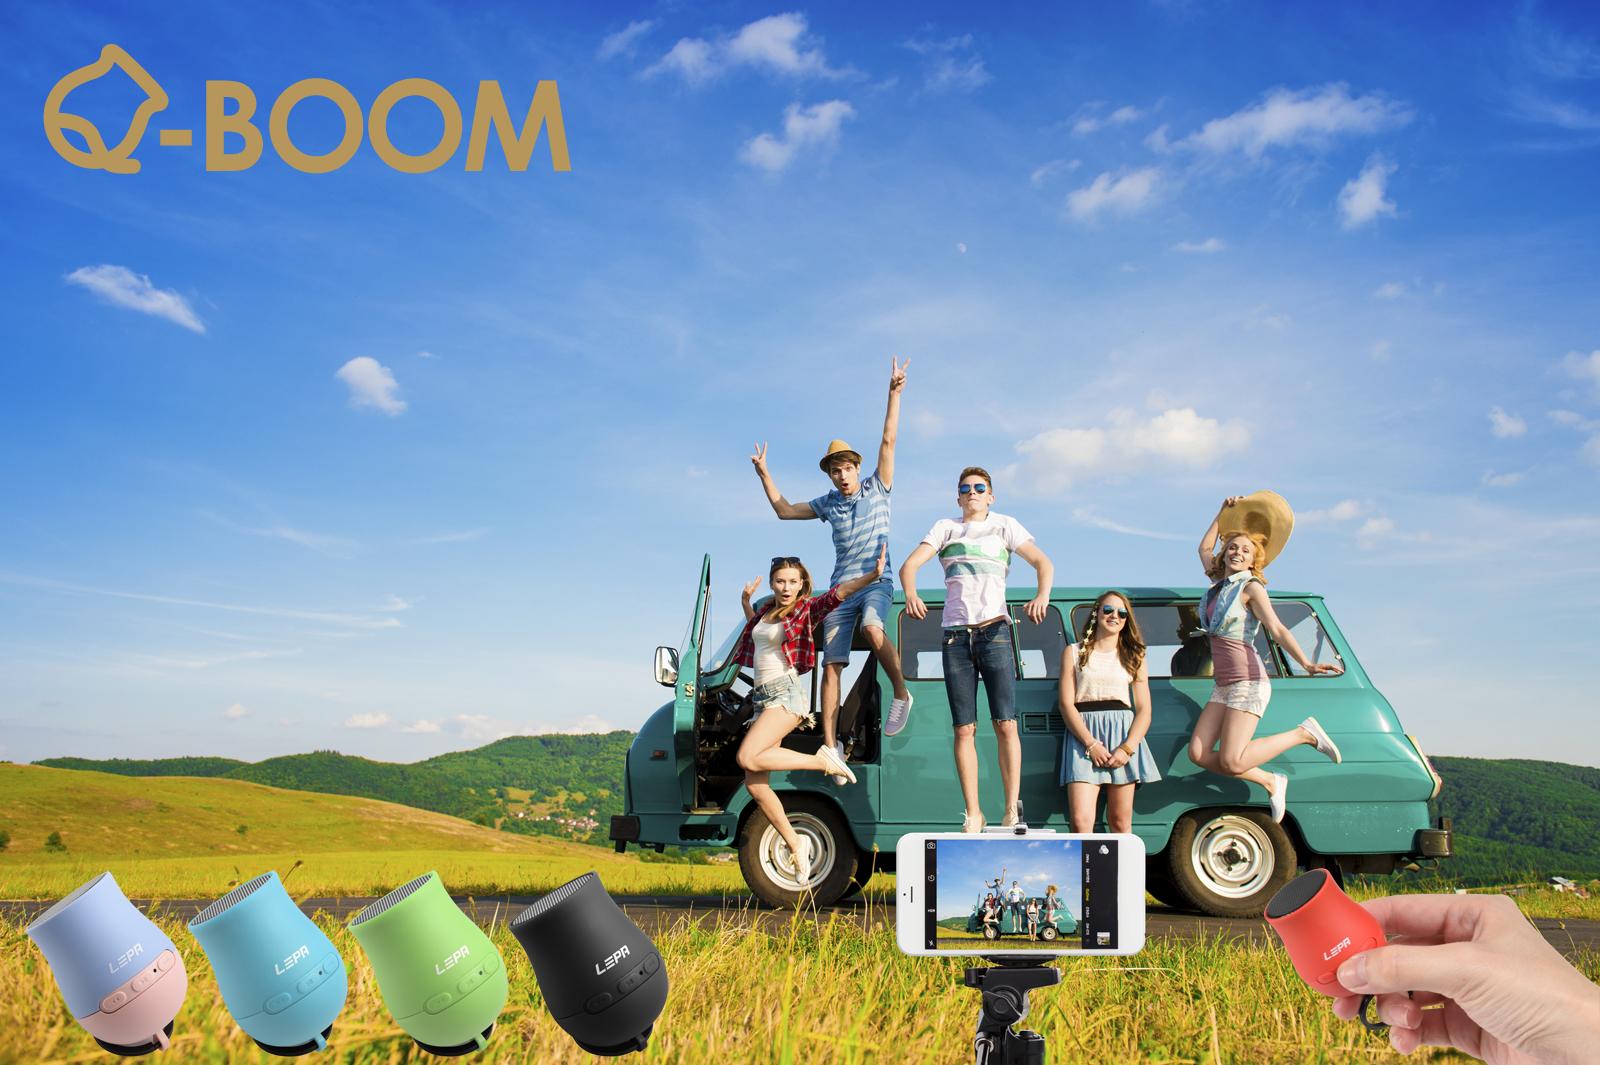 Q-Boom Bluetooth Speaker